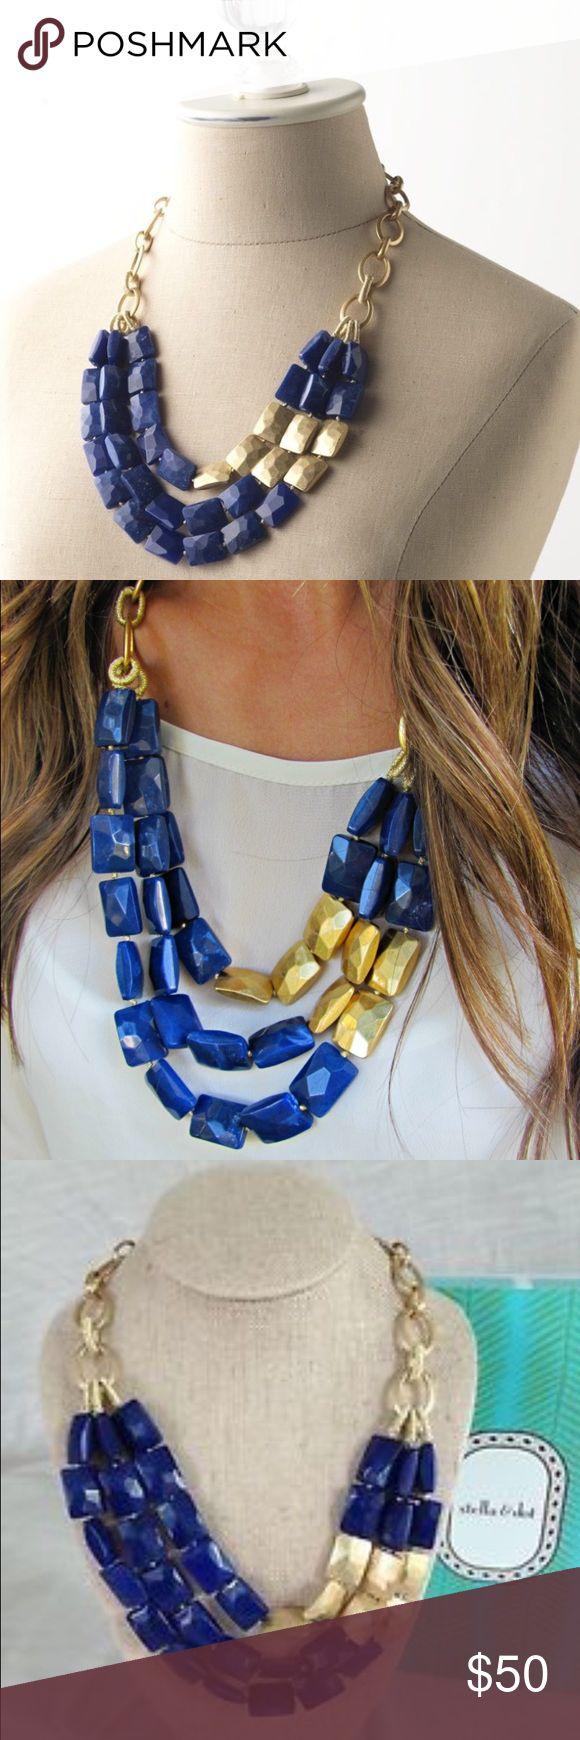 Stella & Dot Bahari Necklace. Stella & Dot Bahari Necklace. New in box. Stella & Dot Jewelry Necklaces